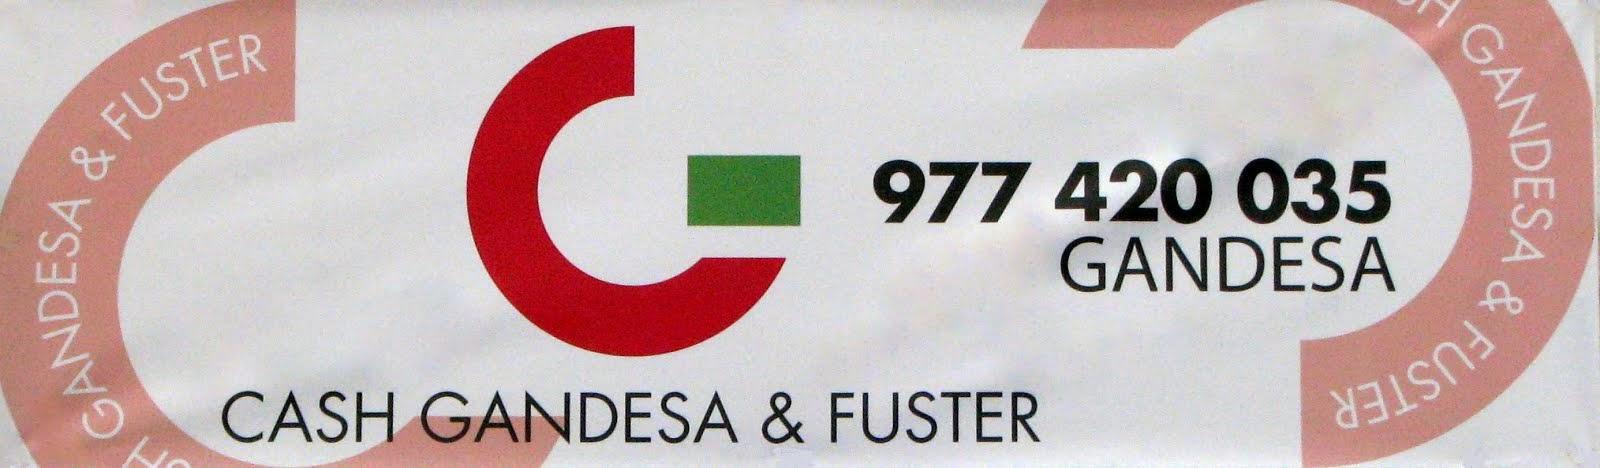 CASH (Gandesa)